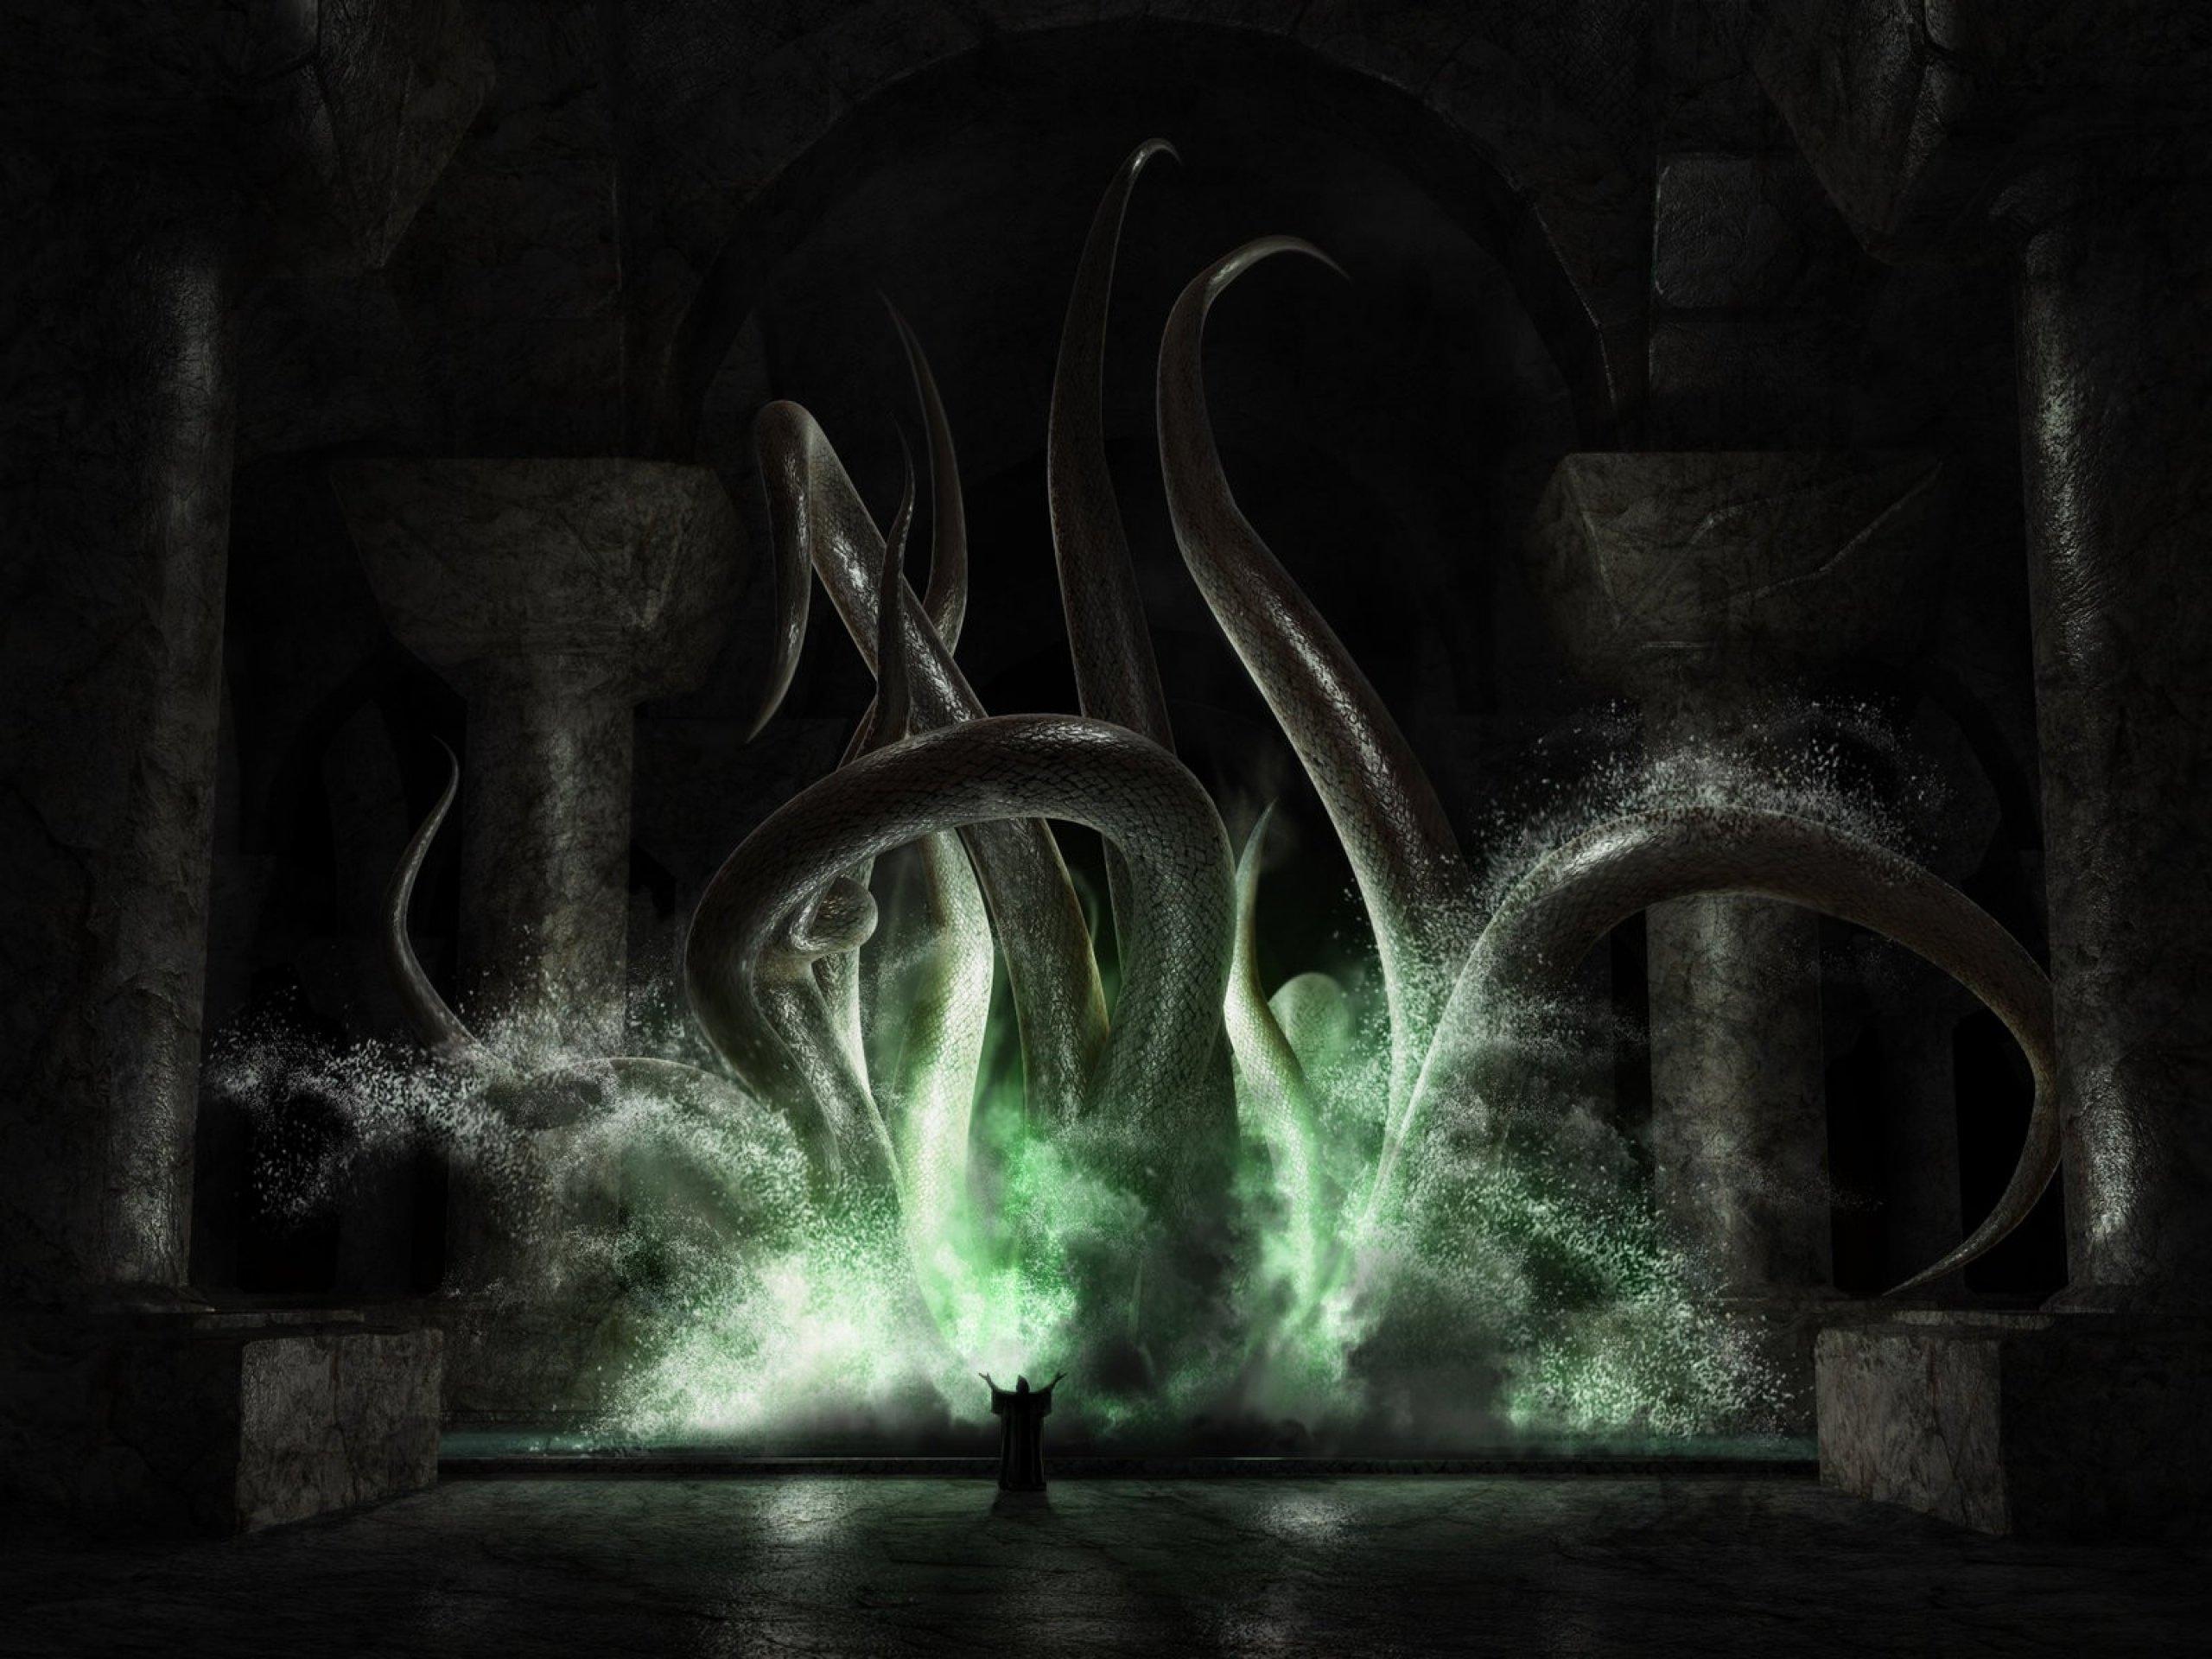 hydra monster wallpaper images